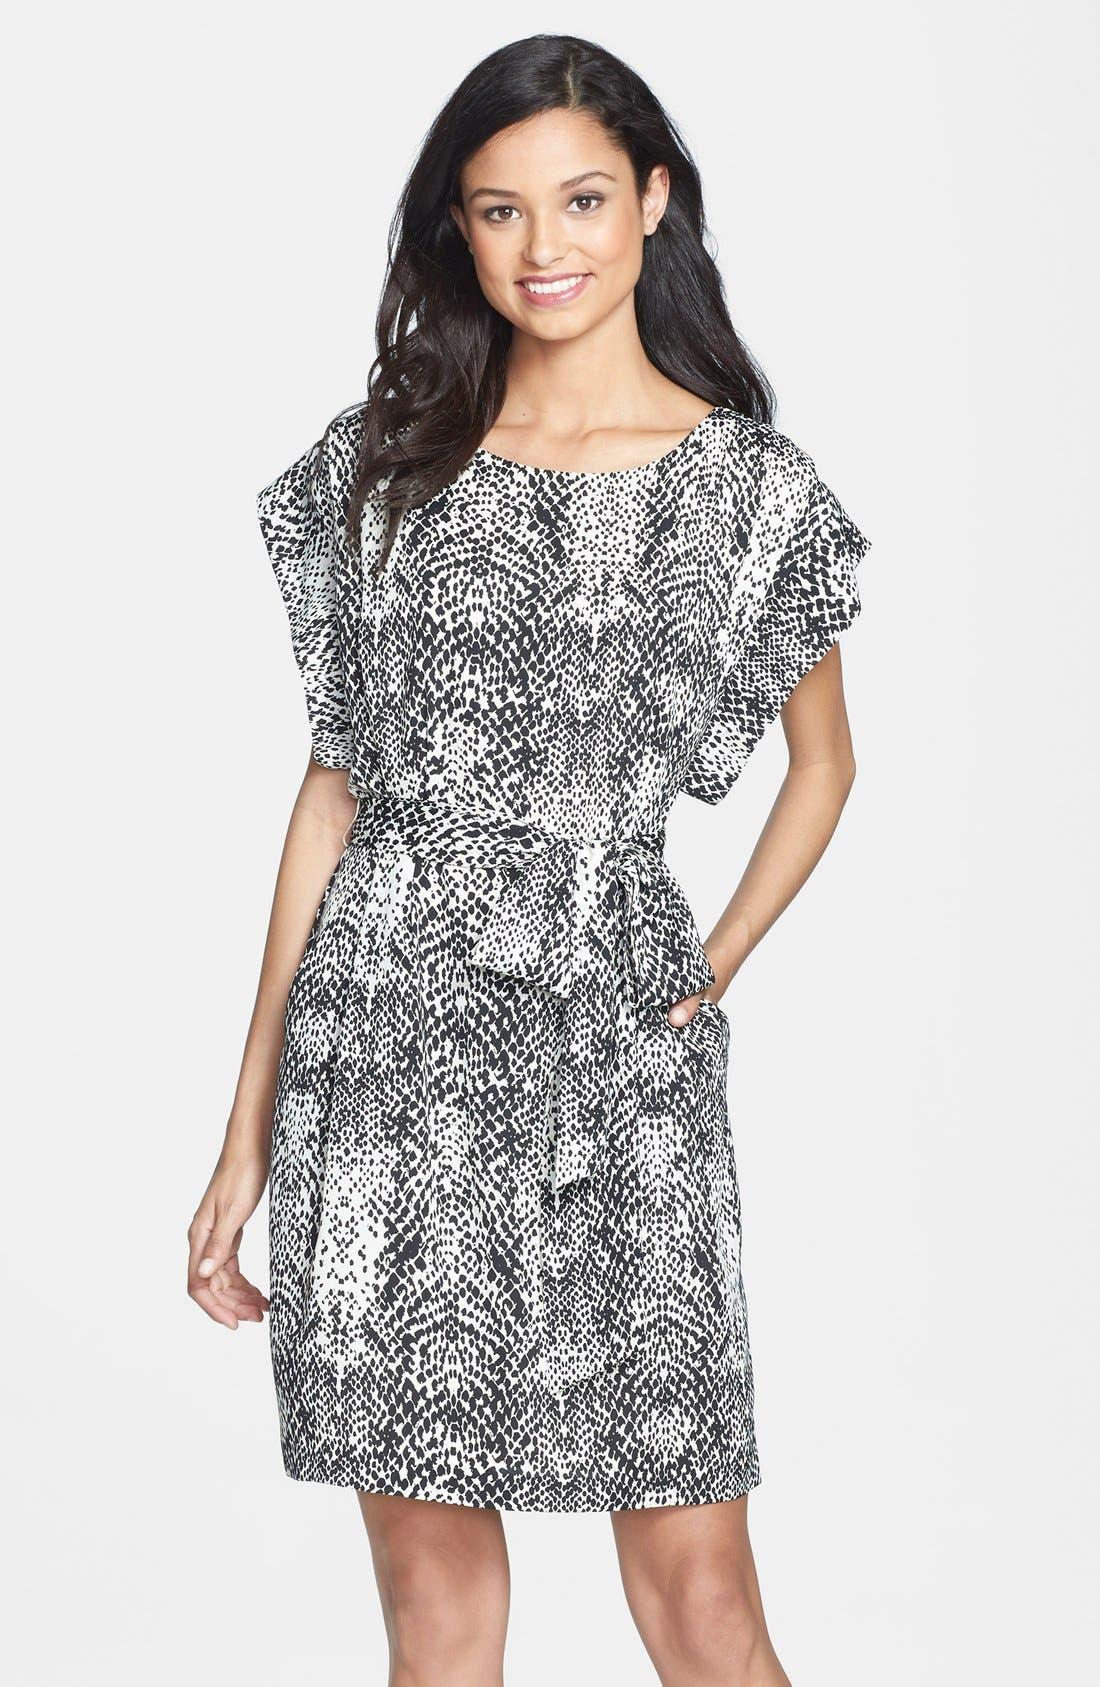 Alternate Image 1 Selected - Eliza J Print Belted Crêpe de Chine Shift Dress (Regular & Petite)